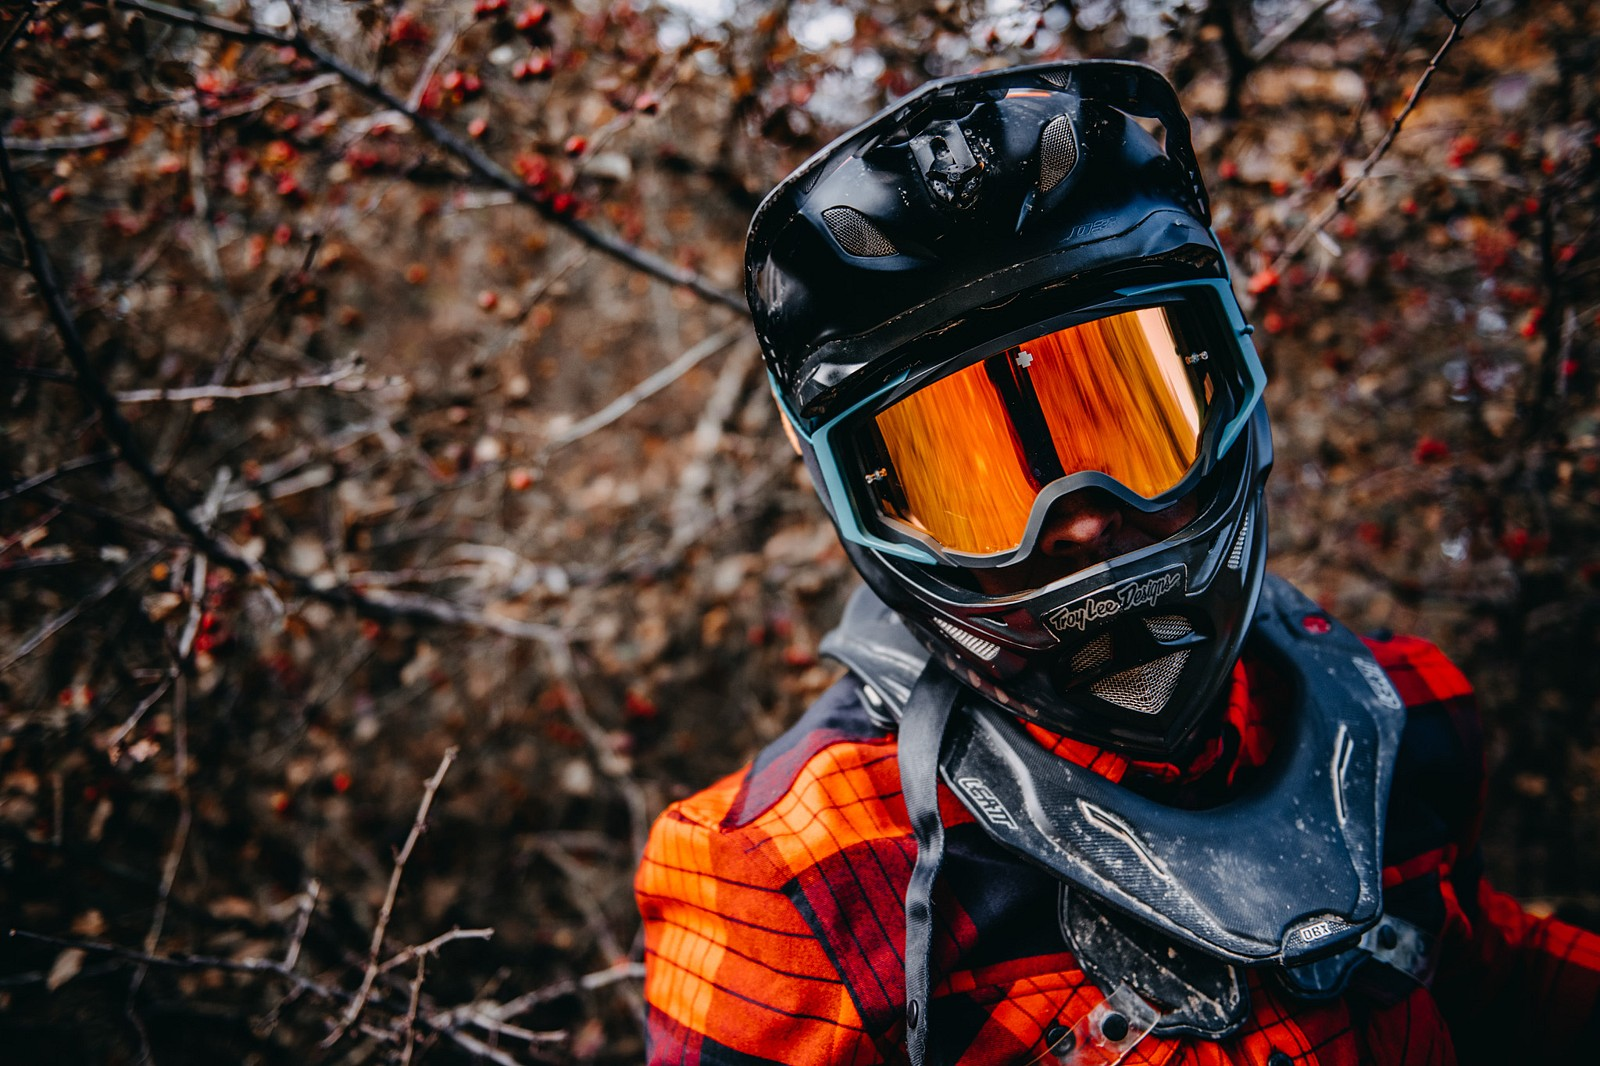 E5B7FBB2-8B65-442F-B71F-A0C296DBC7FD - Arczii95 - Mountain Biking Pictures - Vital MTB